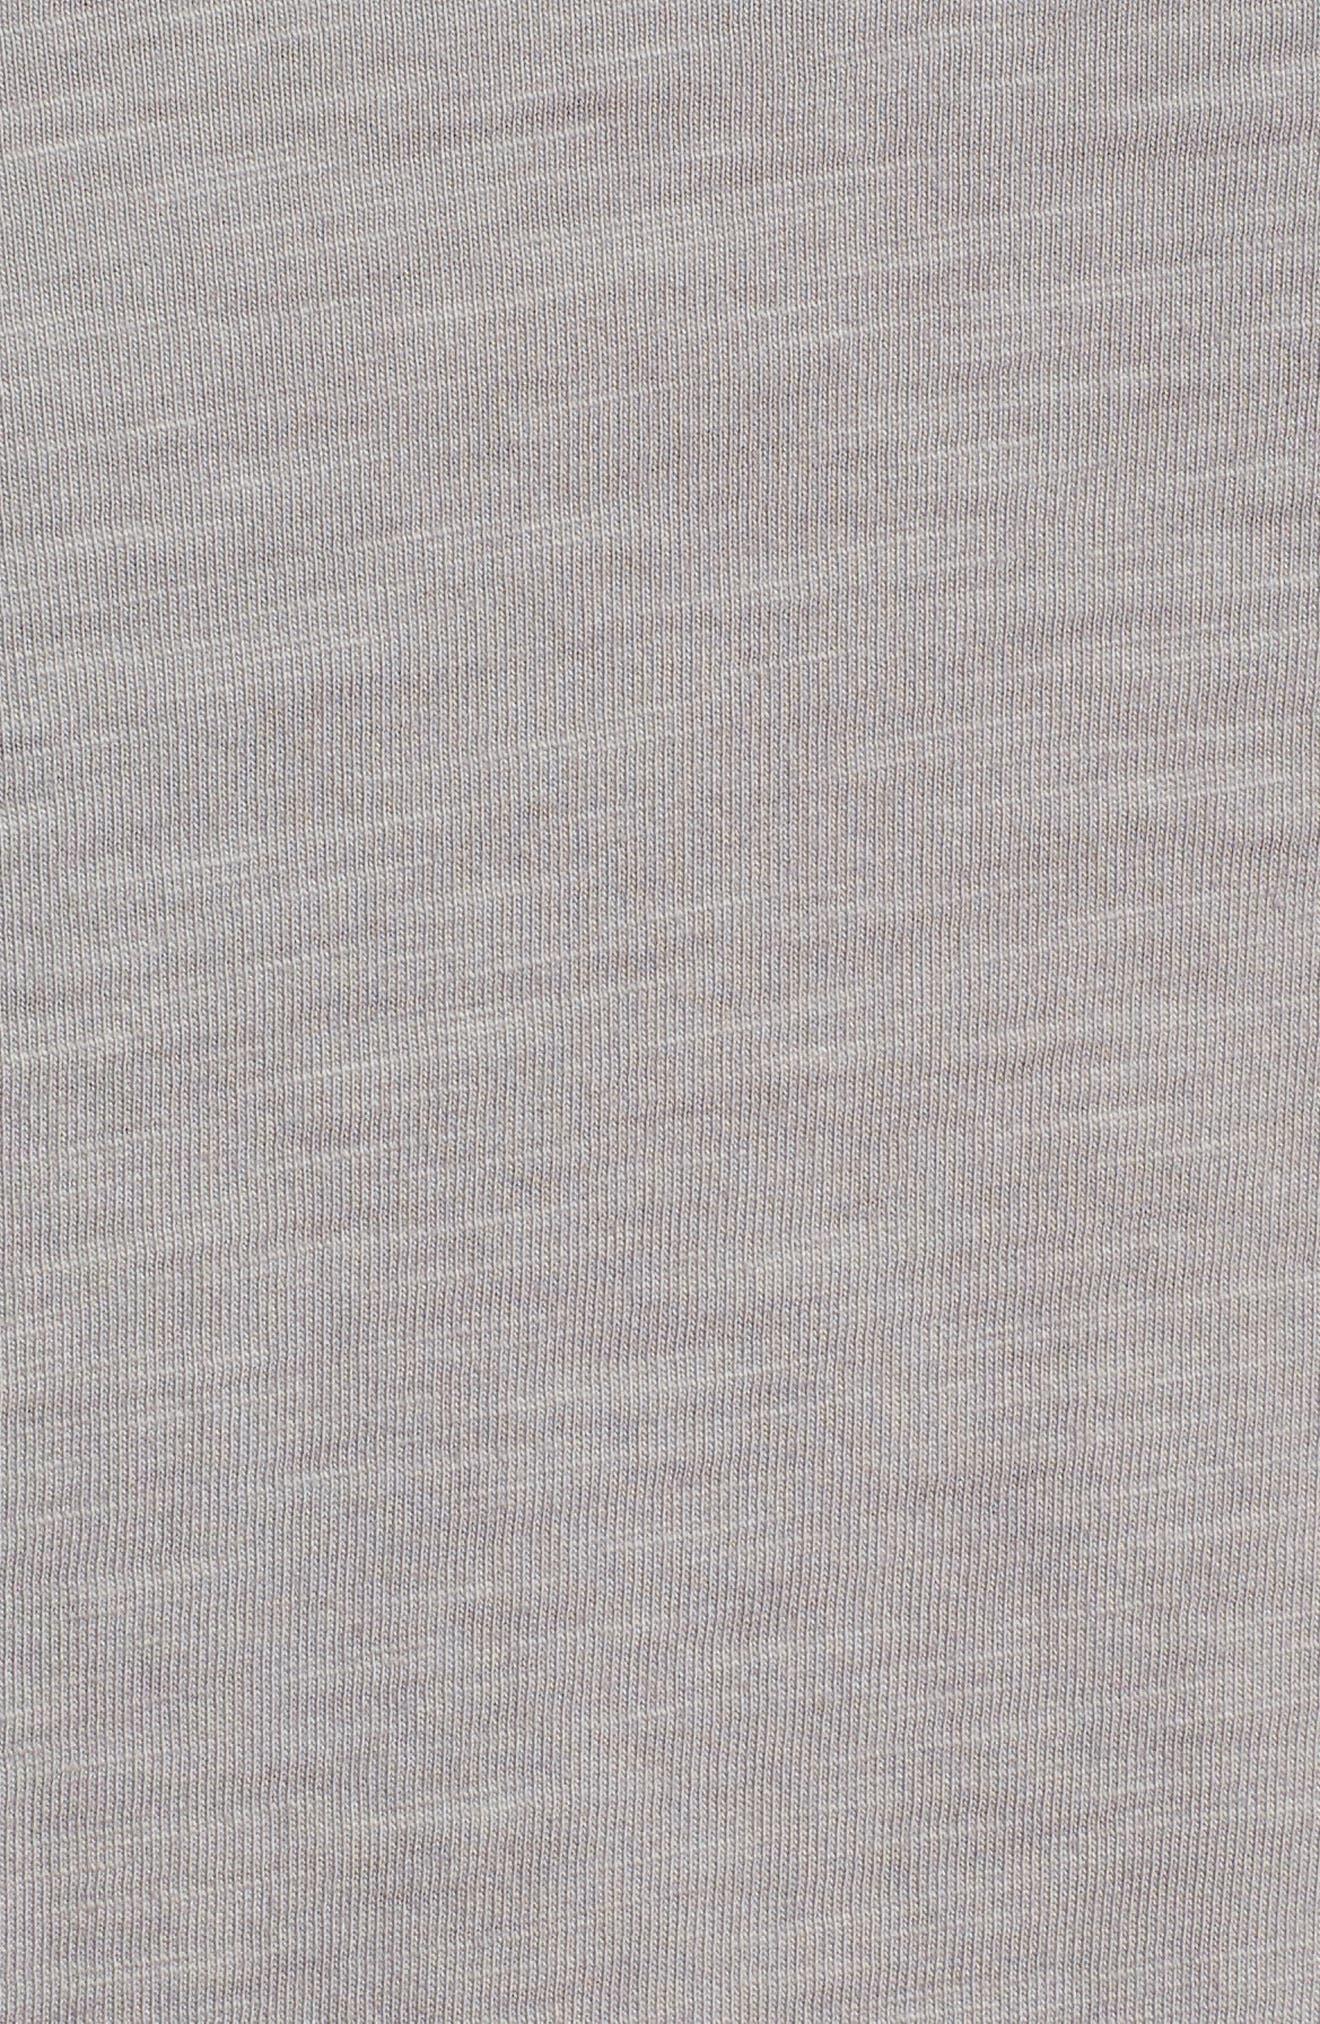 Sunwash Pocket T-Shirt,                             Alternate thumbnail 5, color,                             017